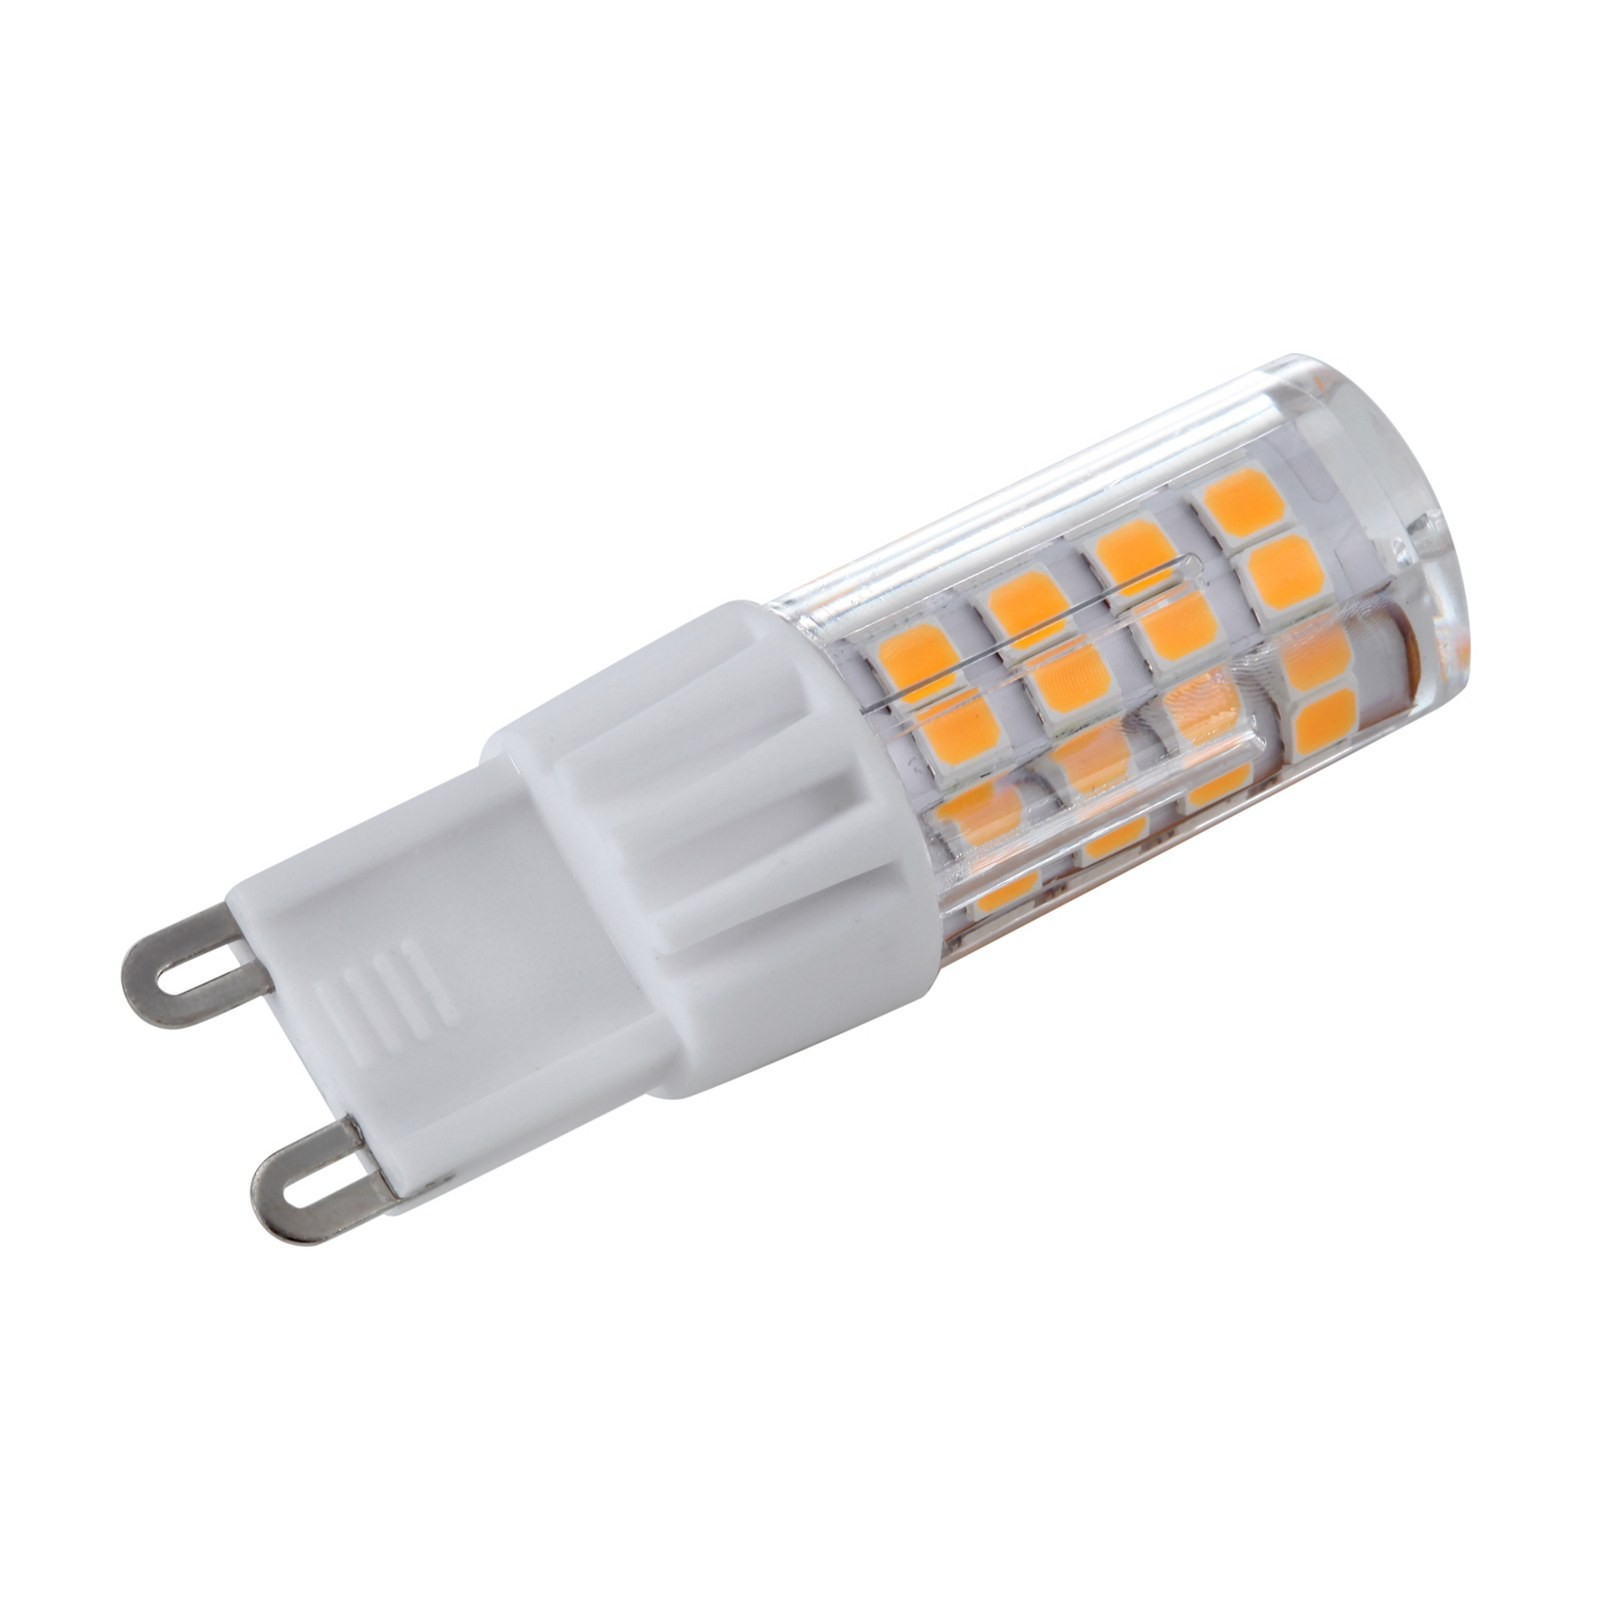 Life lampada led g9 5 0w 6500k led epist for Lampada led 50 watt